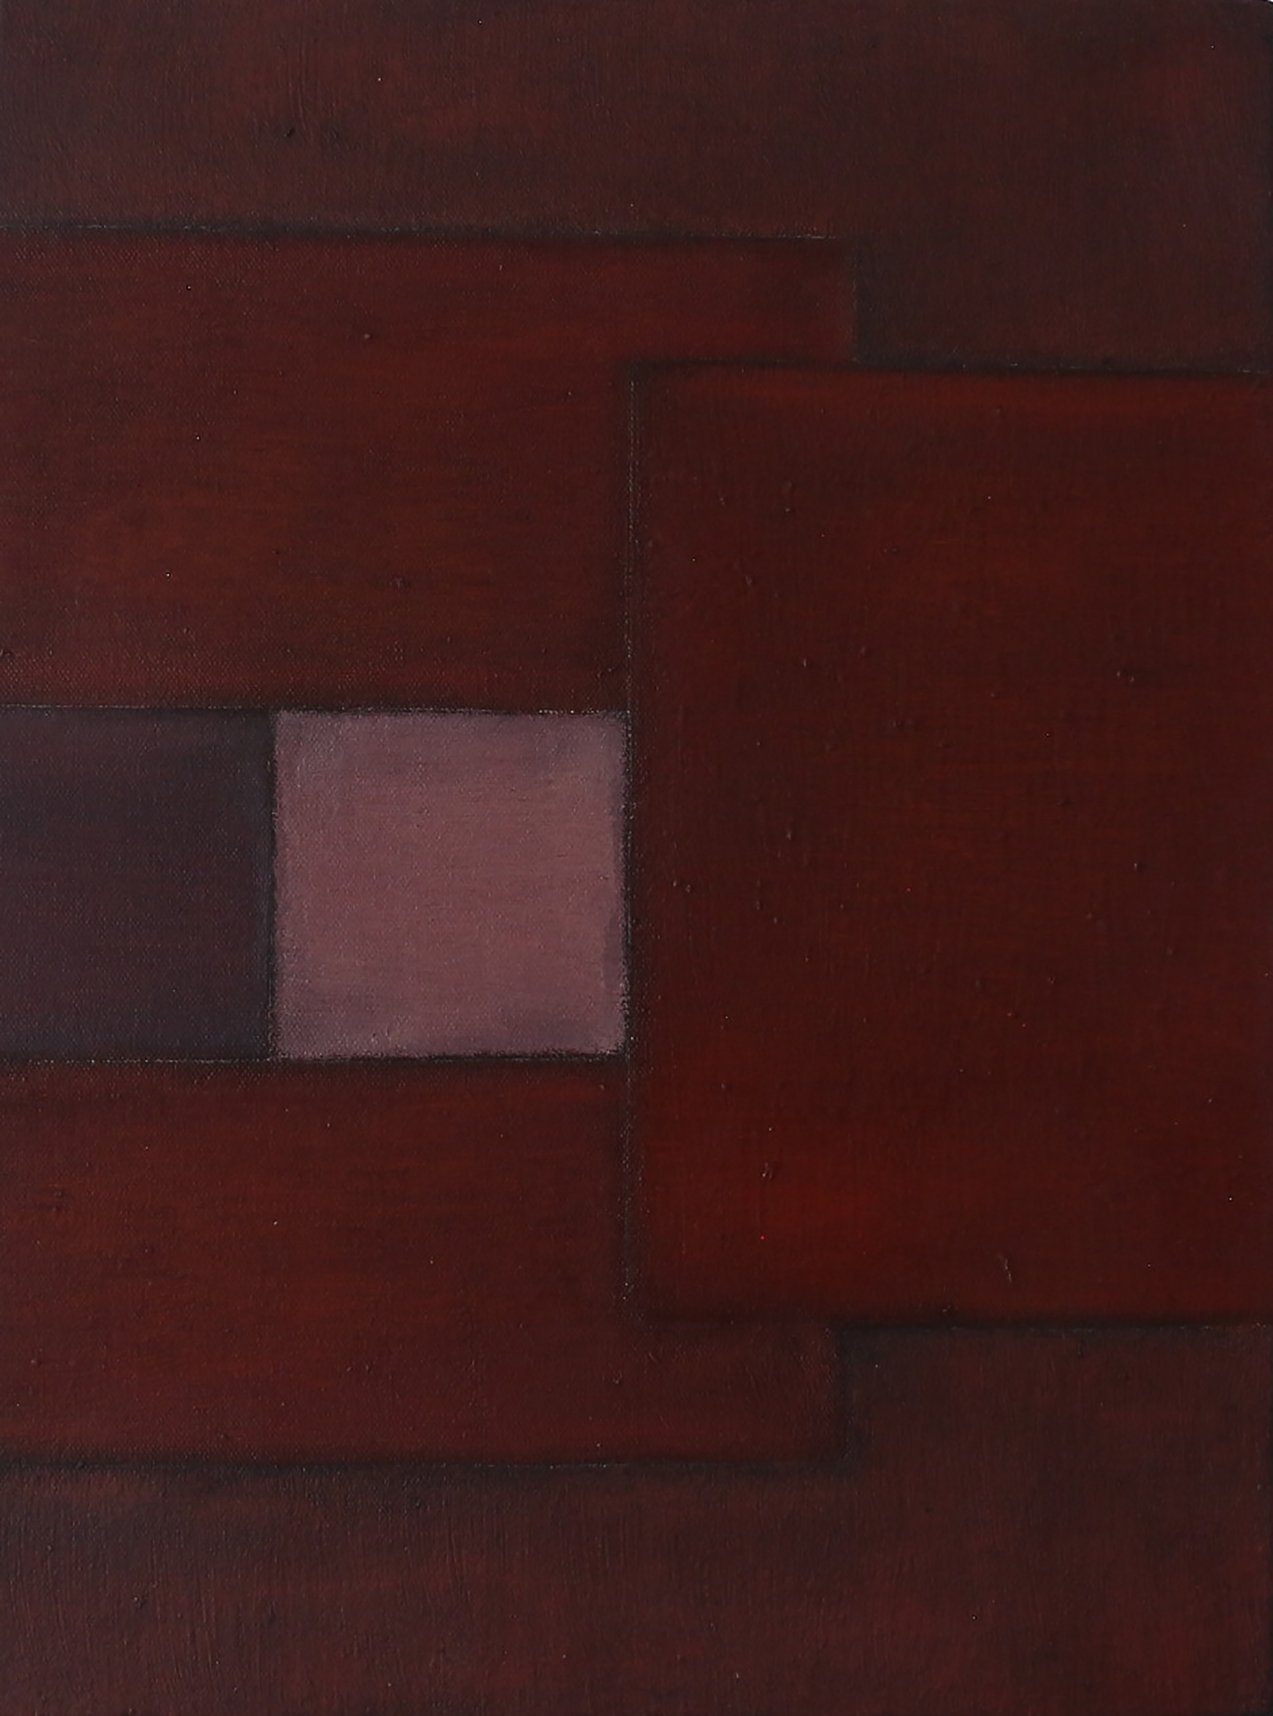 BIG RED (2020) - Ximena Samudio